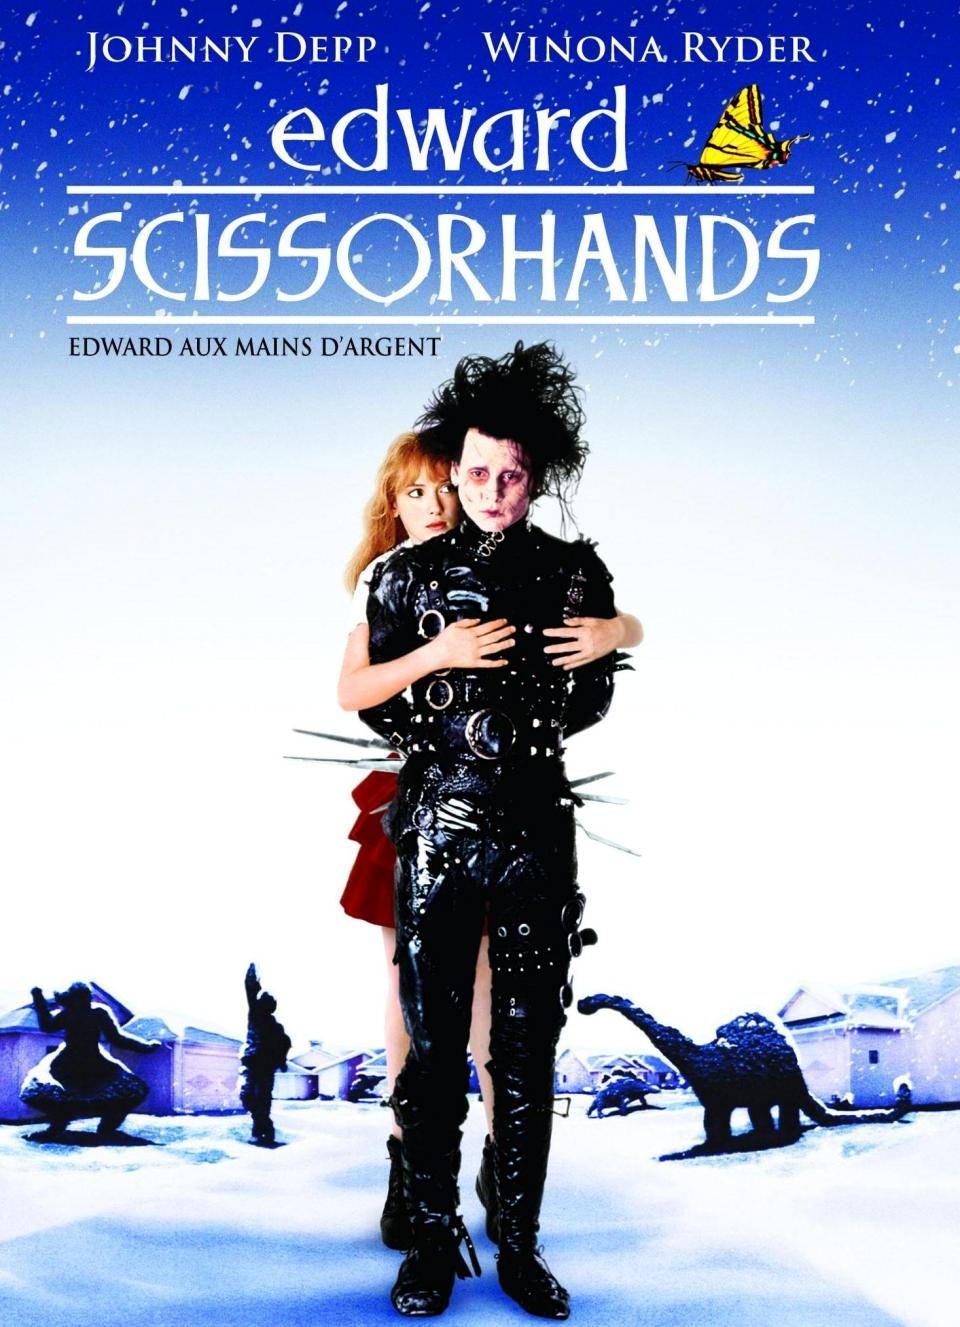 "edward scissorhands essay on edward Edward scissor hands (1990) by tim burton, is a romantic fantasy film centred upon a character edward scissorhands essay ""edward scissorhands"" by tim burton."